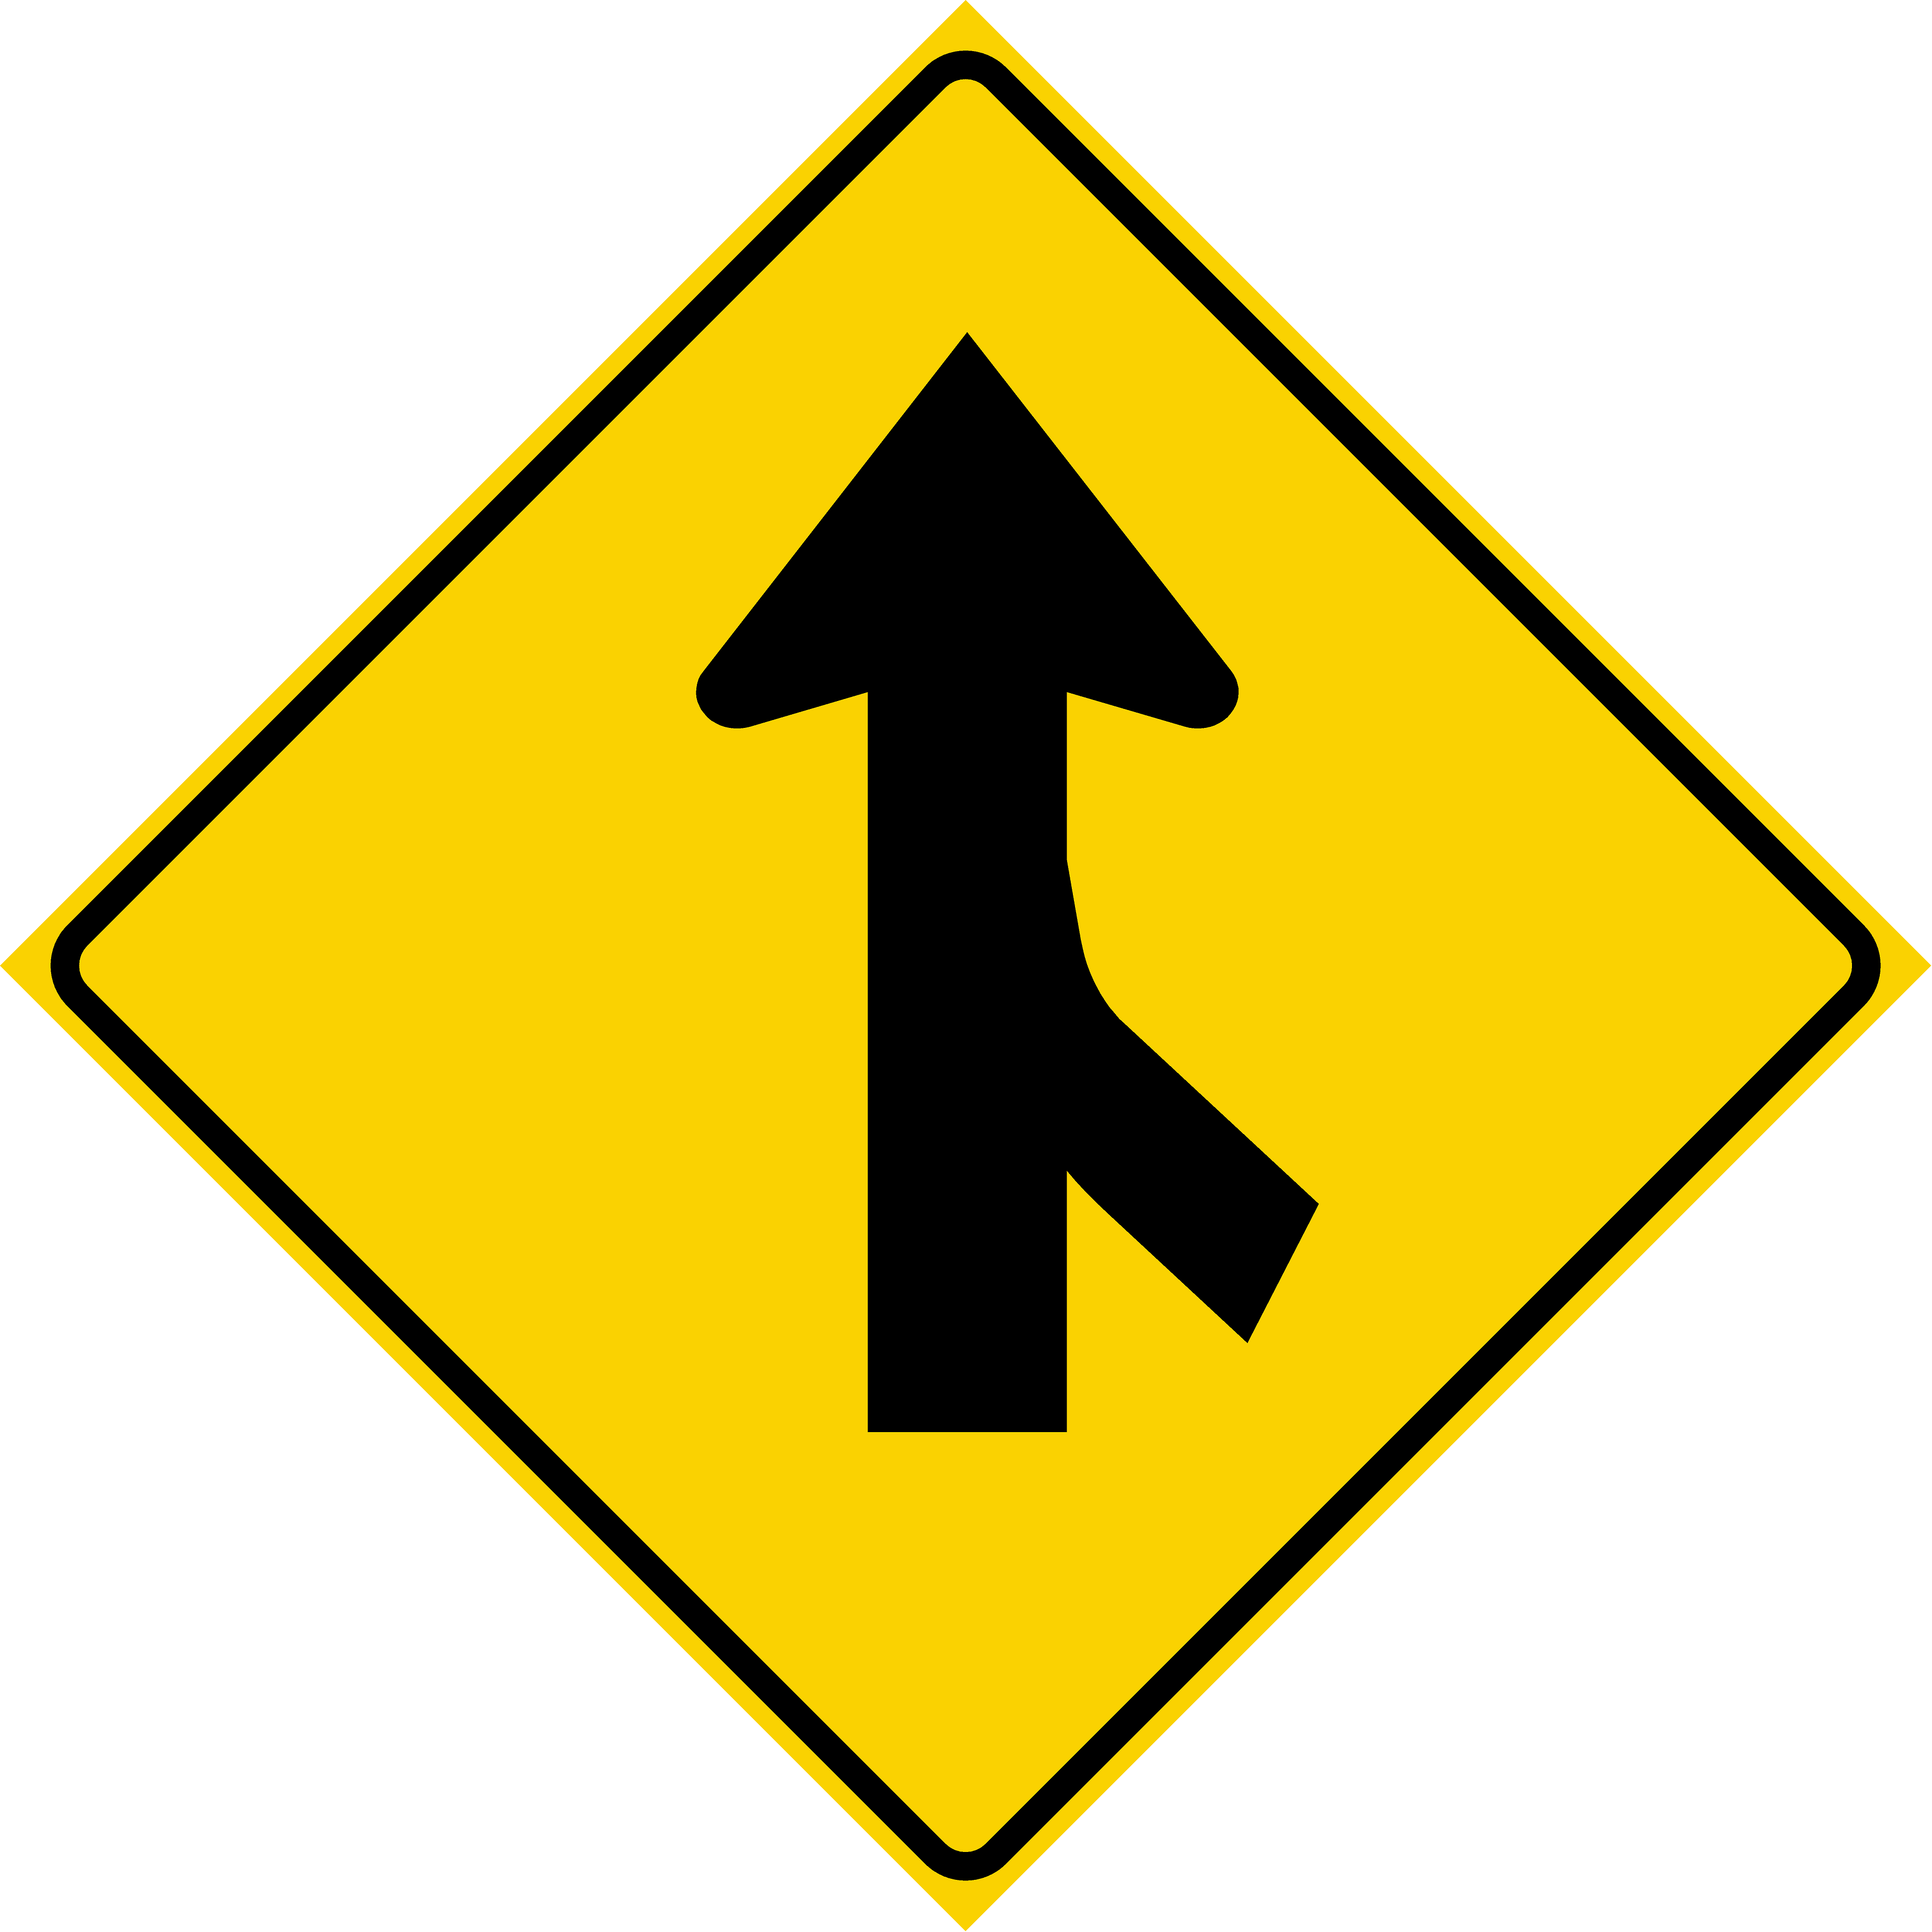 Merge Symbol (W4-1)